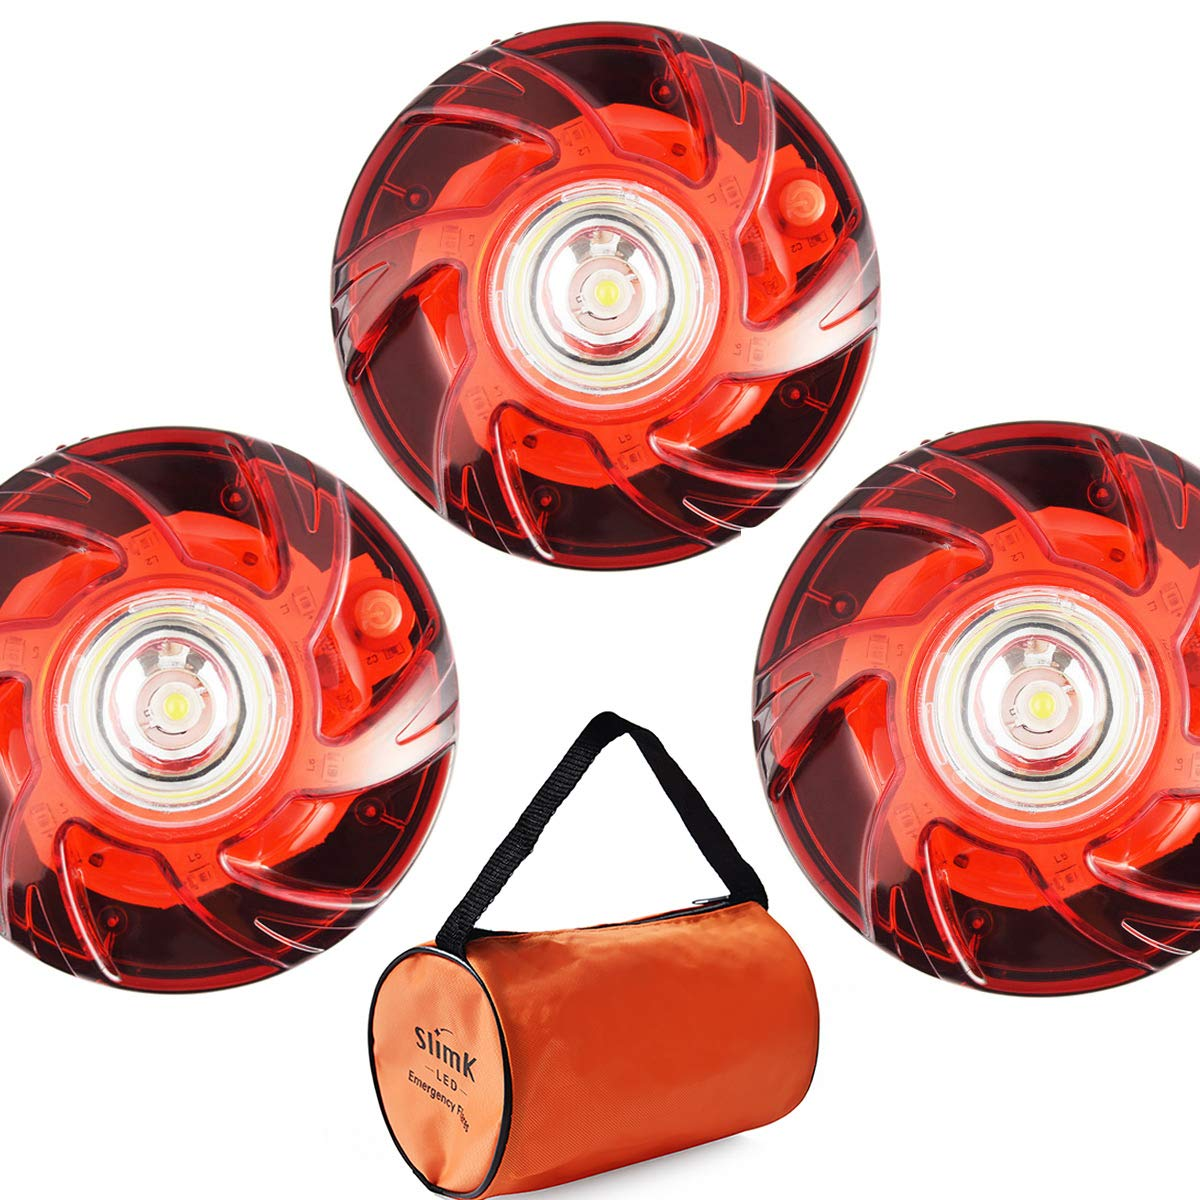 Upgrade Design 6 Modes Visible Up to 2 Miles Away SlimK 3 Pack LED Flare Beacon Auto Roadside Warning Light Safety Emergency Alert